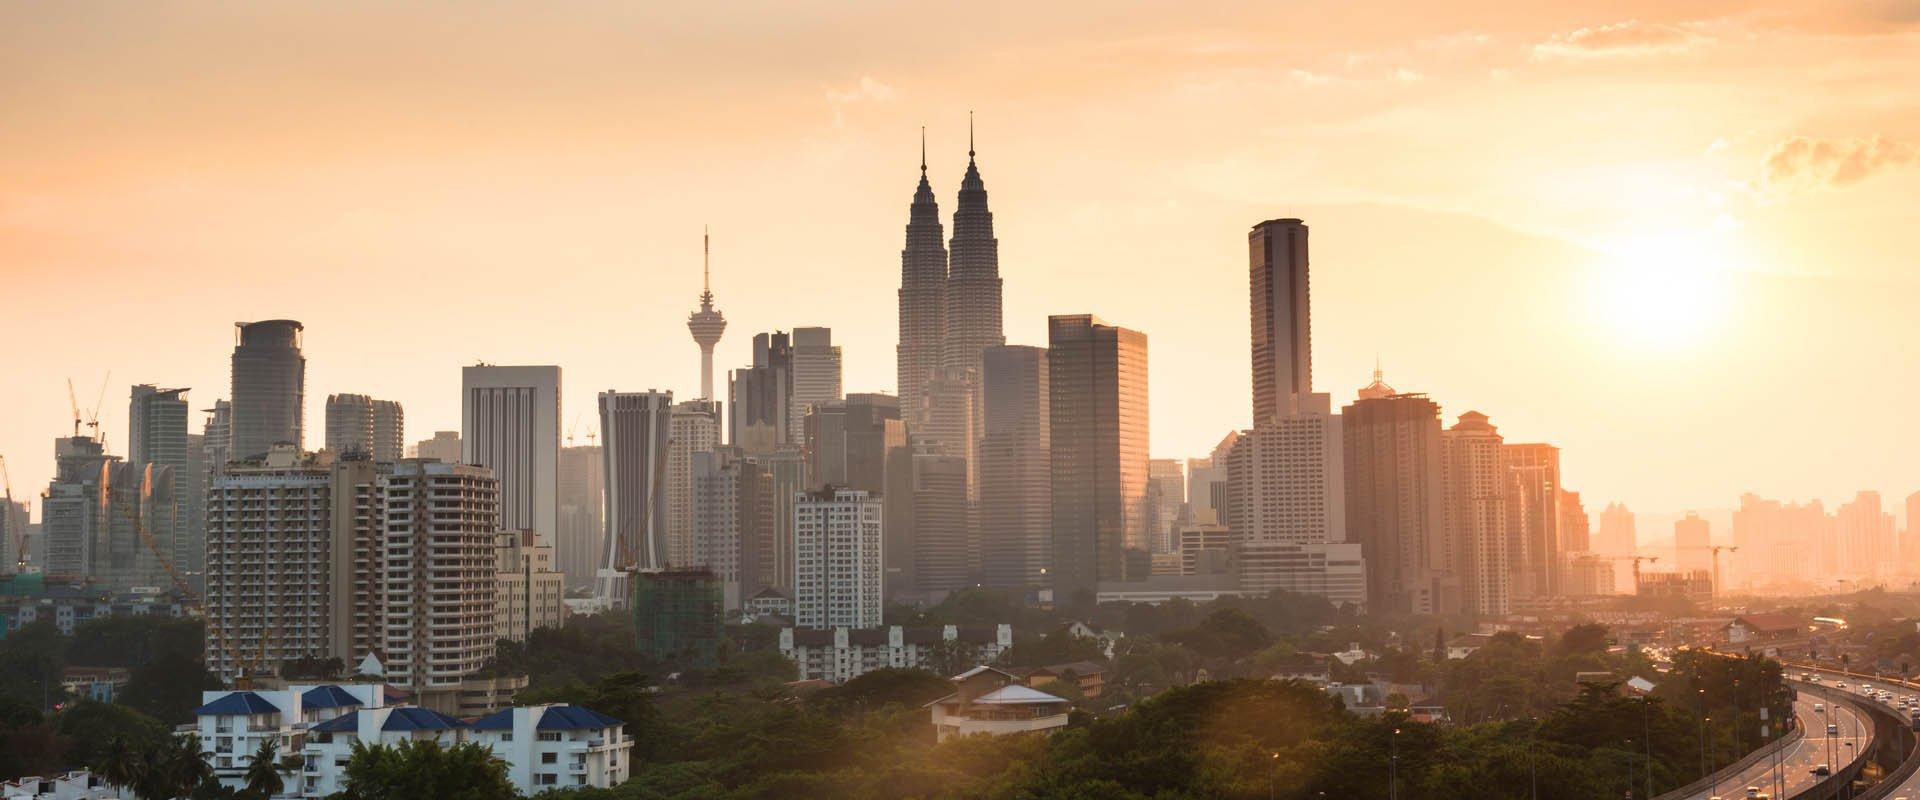 Kuala Lumpur Dating Site Free Online Dating in Kuala Lumpur KL